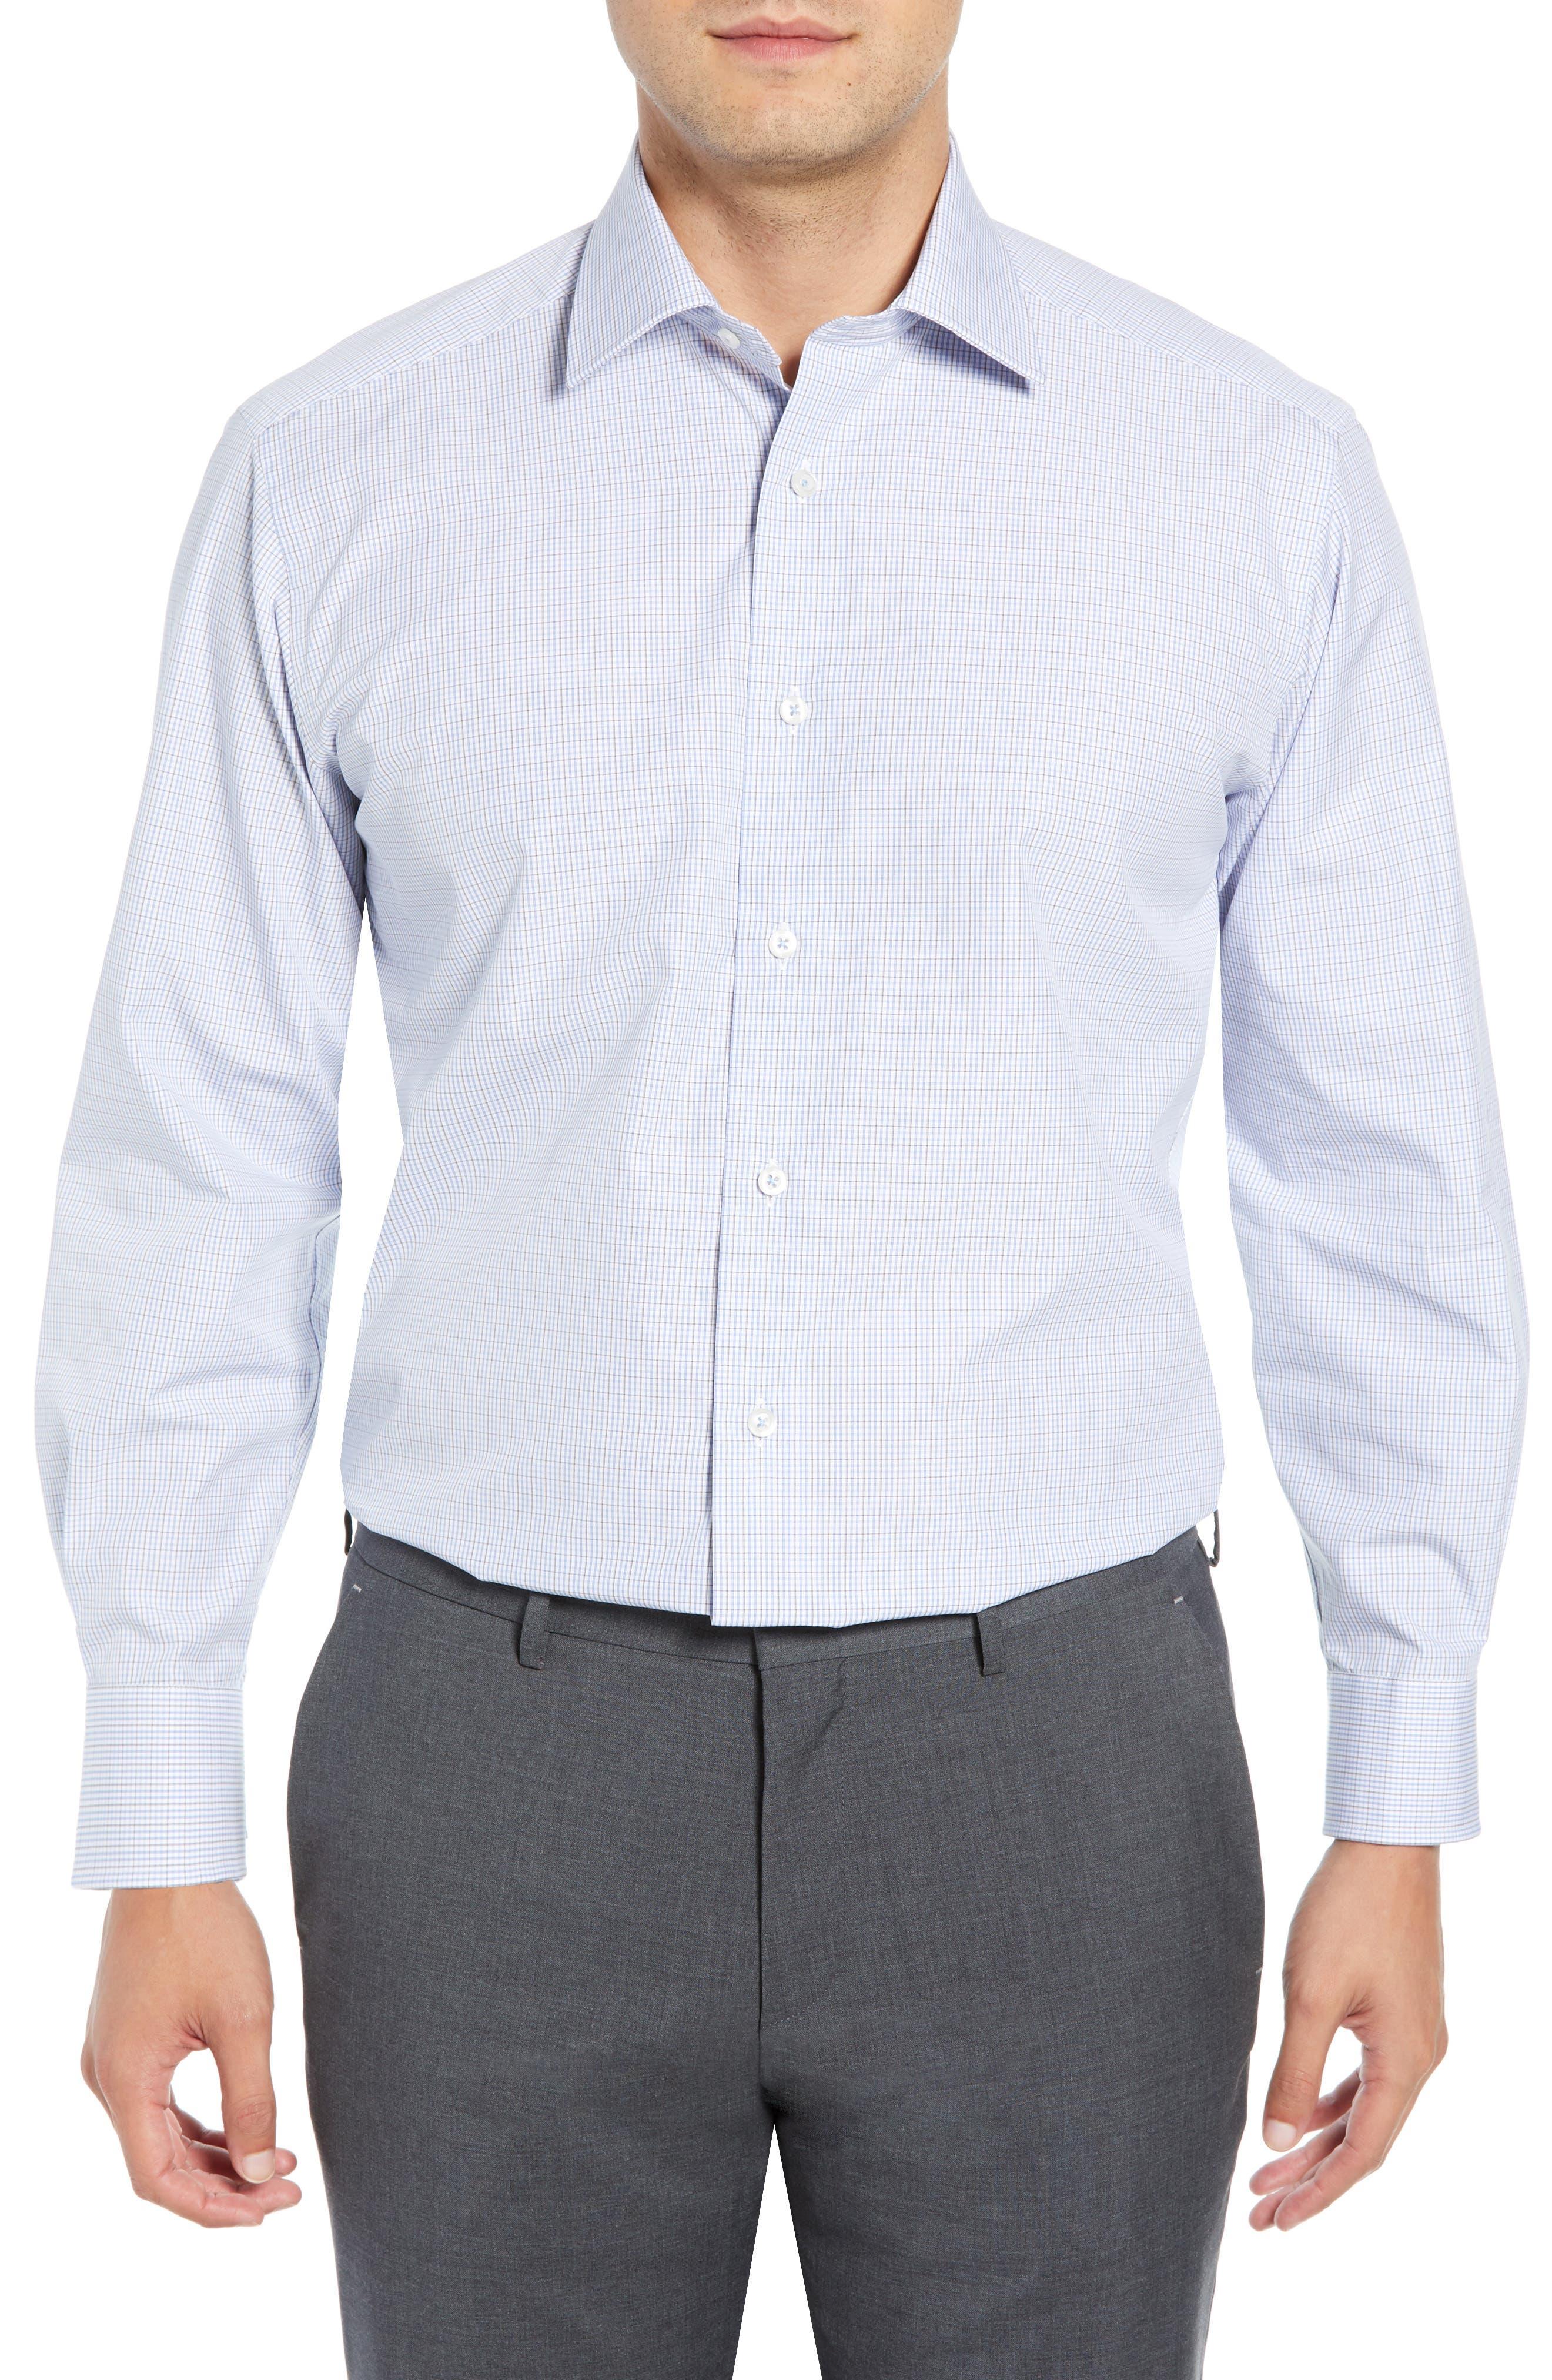 Regular Fit Check Dress Shirt, Main, color, 020